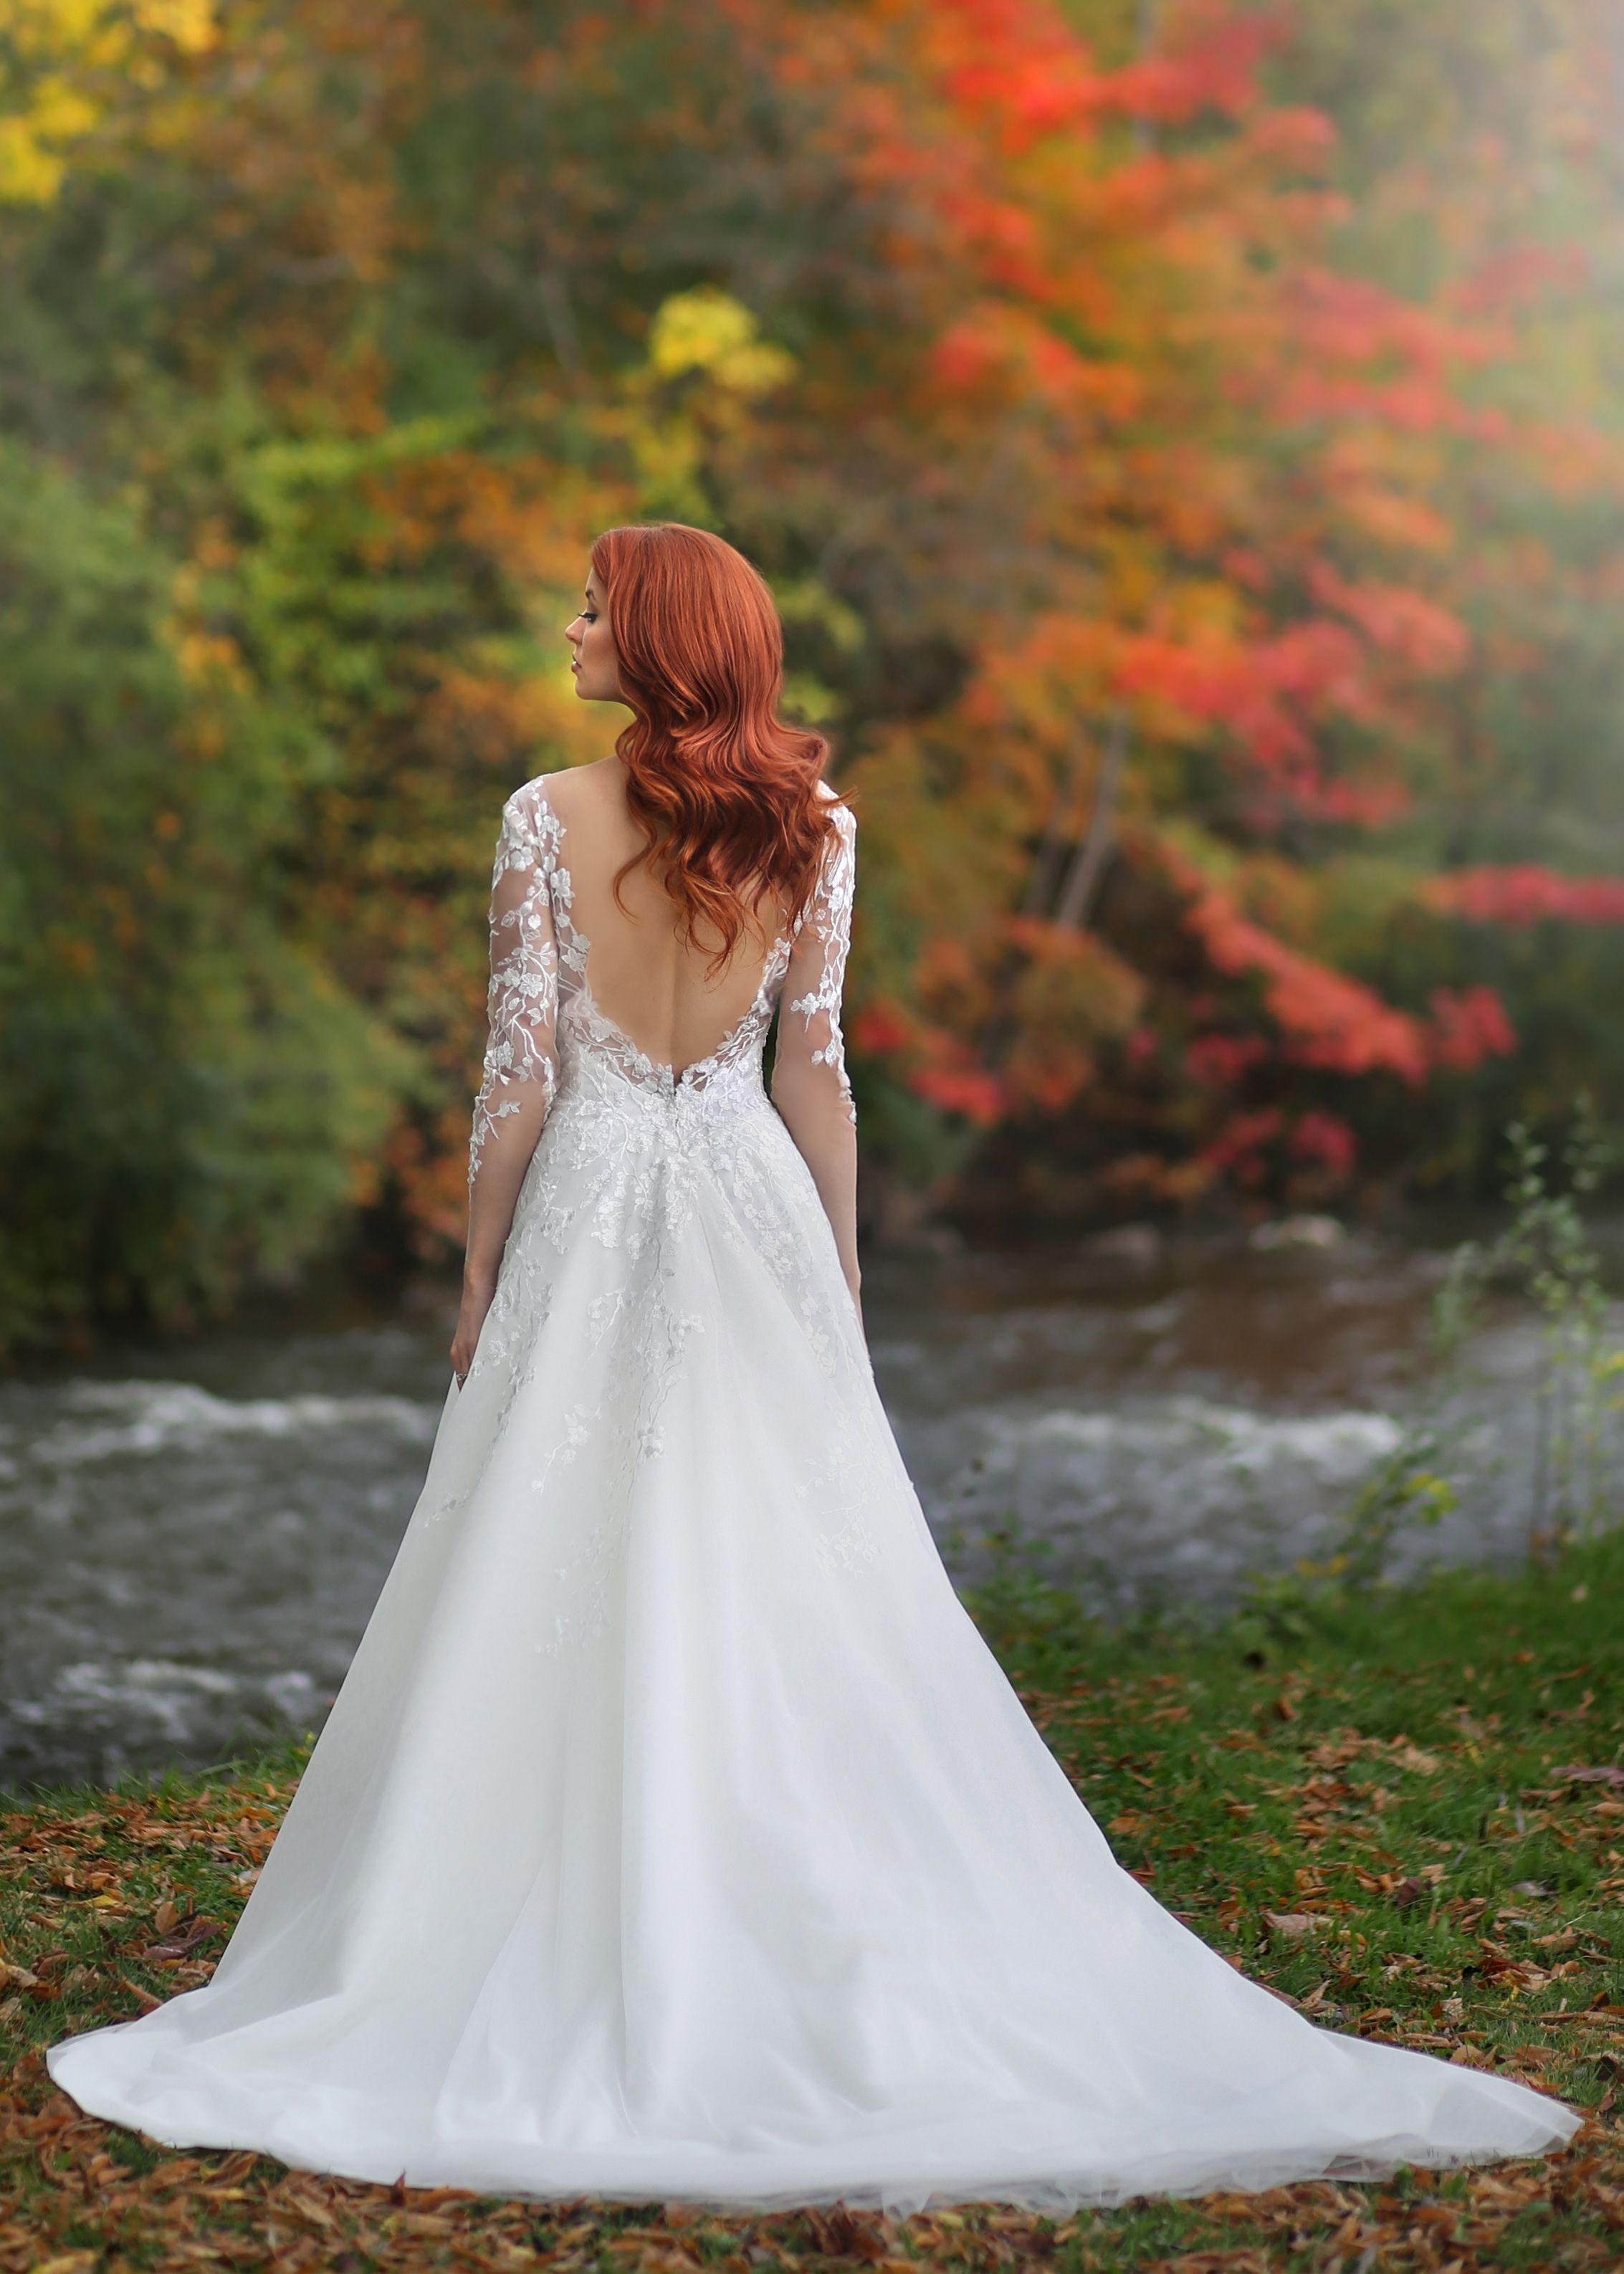 Marisa bridals low back long sleeves wedding dresses from marisa bridals low back long sleeves wedding dresses from solutions bridal in orlando florida ombrellifo Images